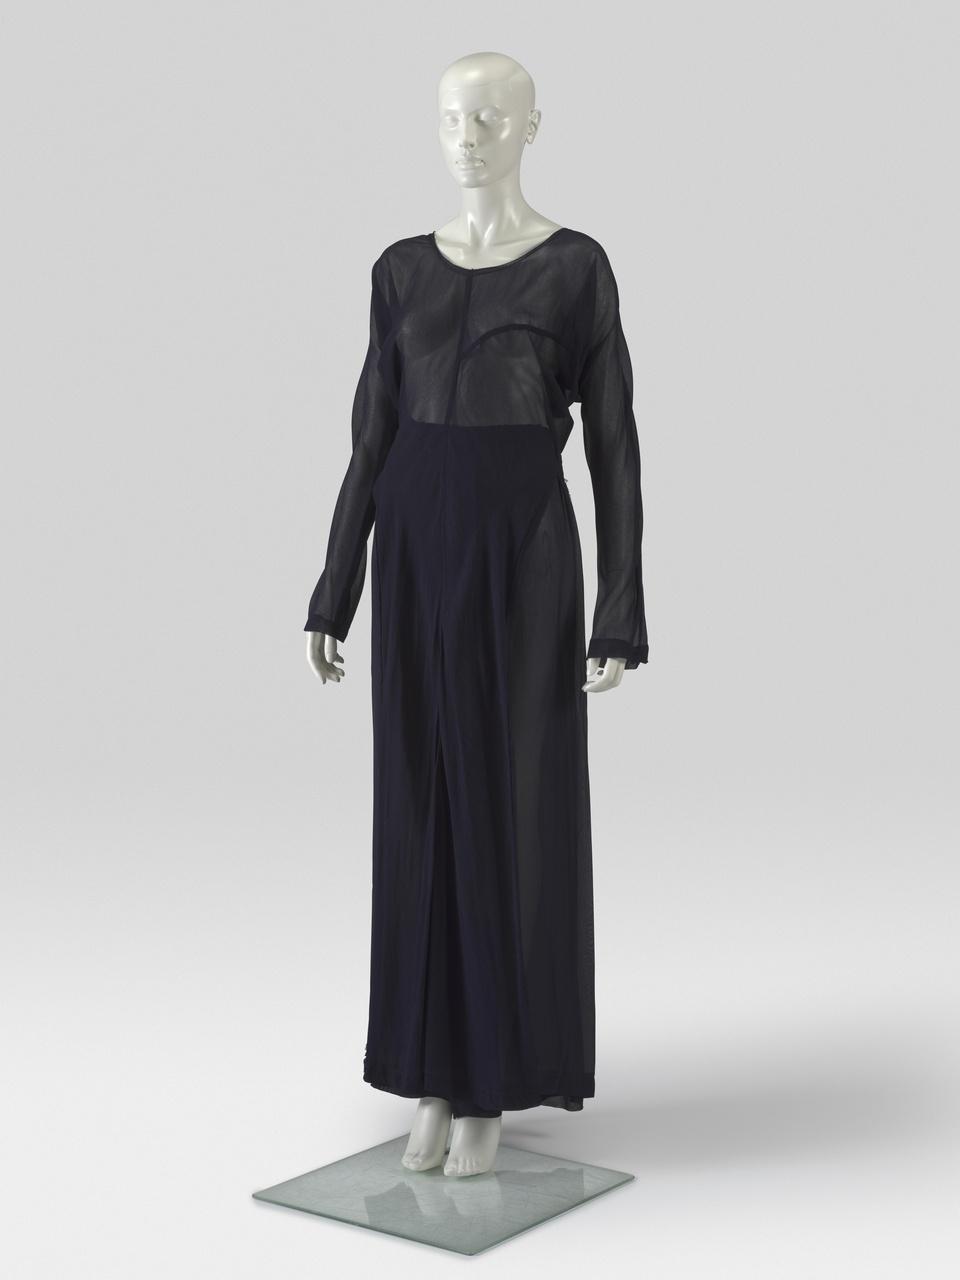 Donkerblauw ensemble bestaande uit broek en top